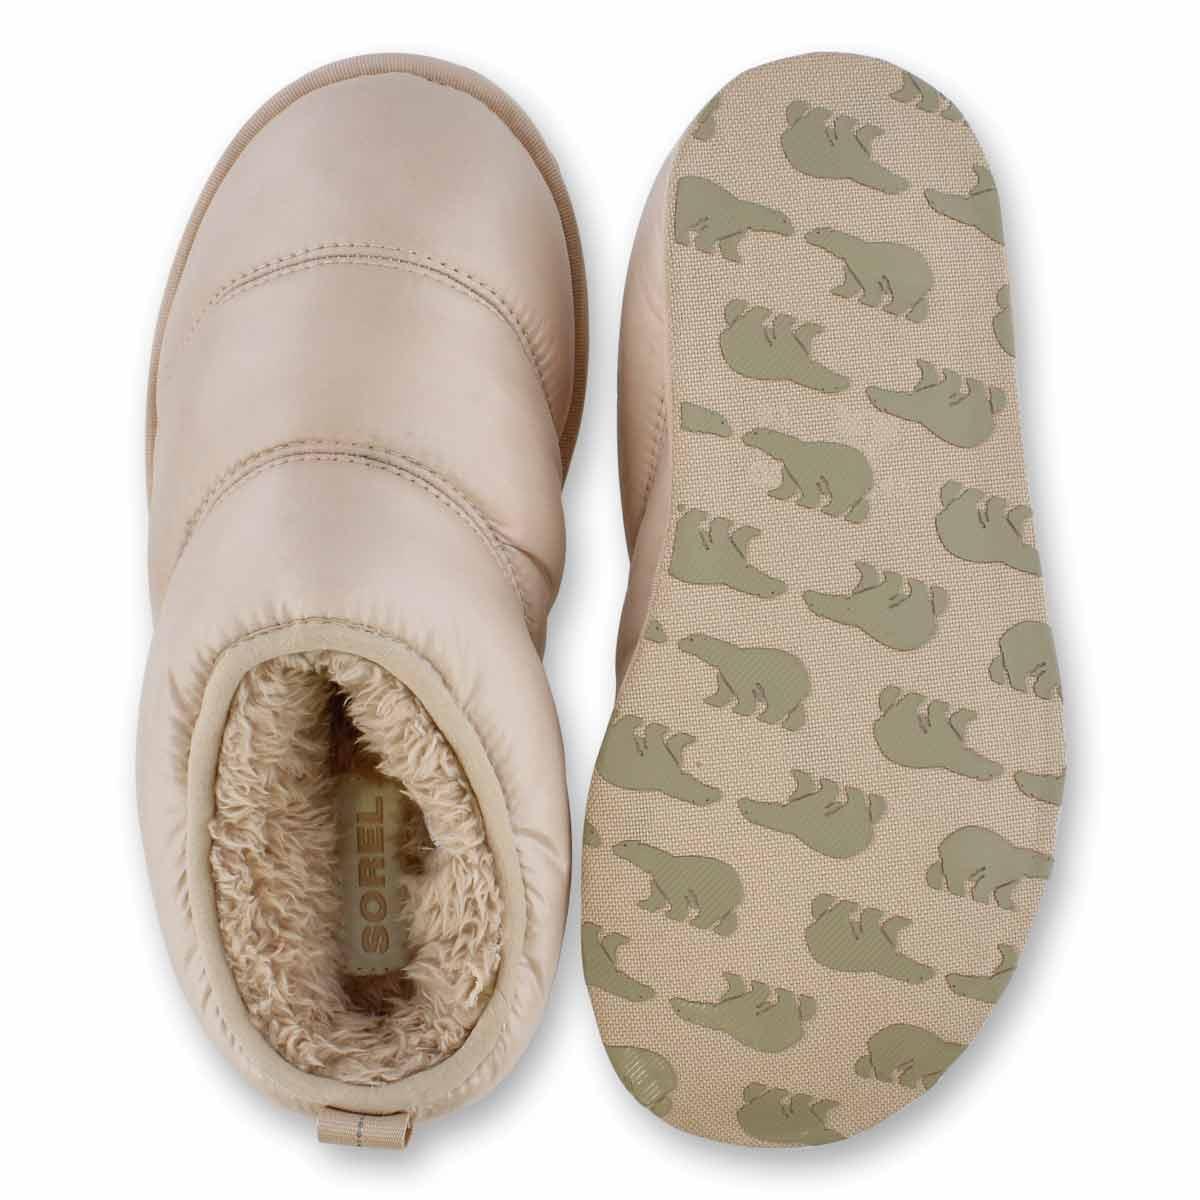 Lds Hadley natural tan open back slipper